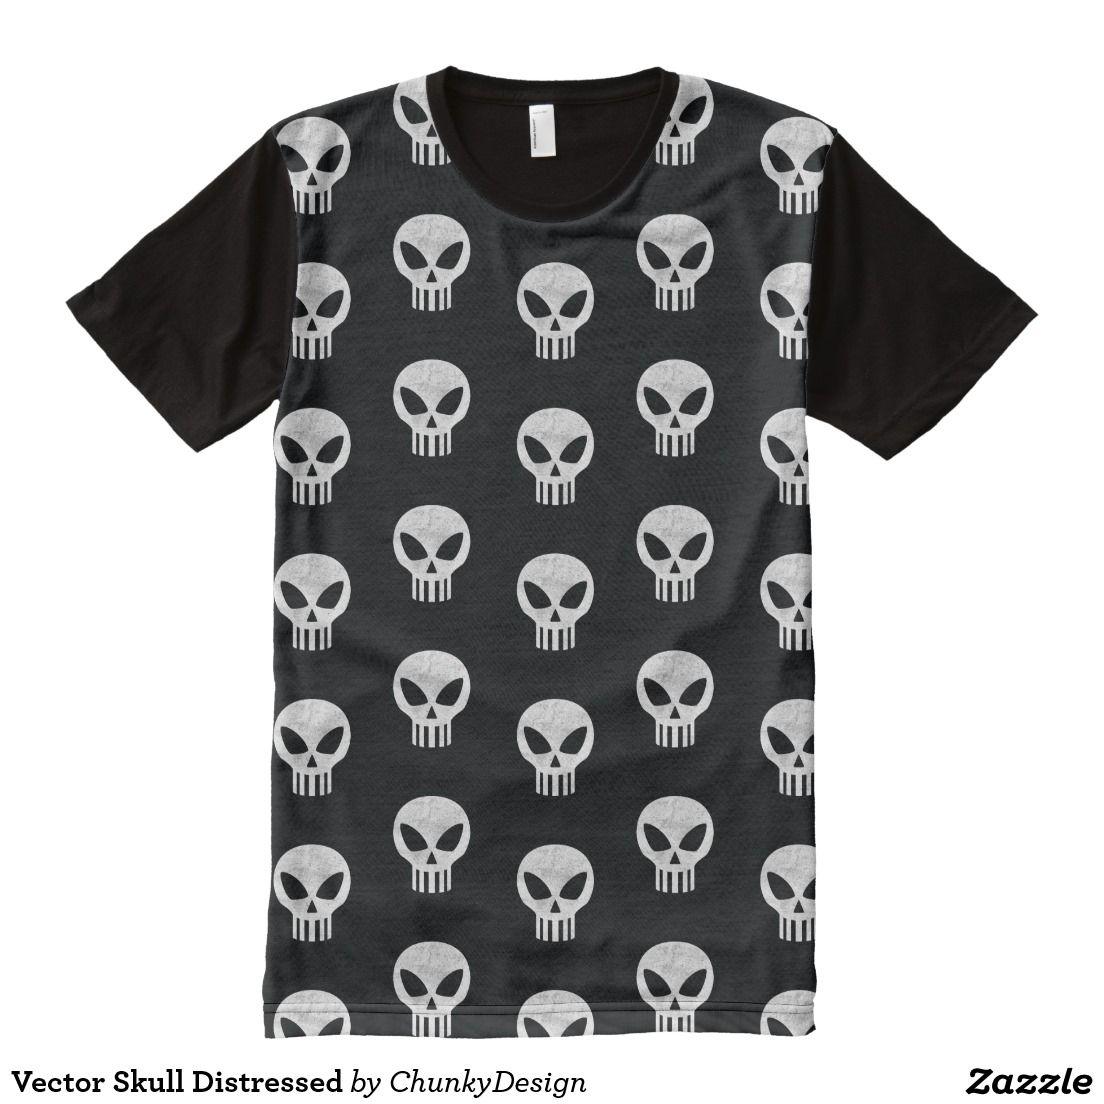 Vector Skull Distressed AllOver Print Tshirt. Cool Gift